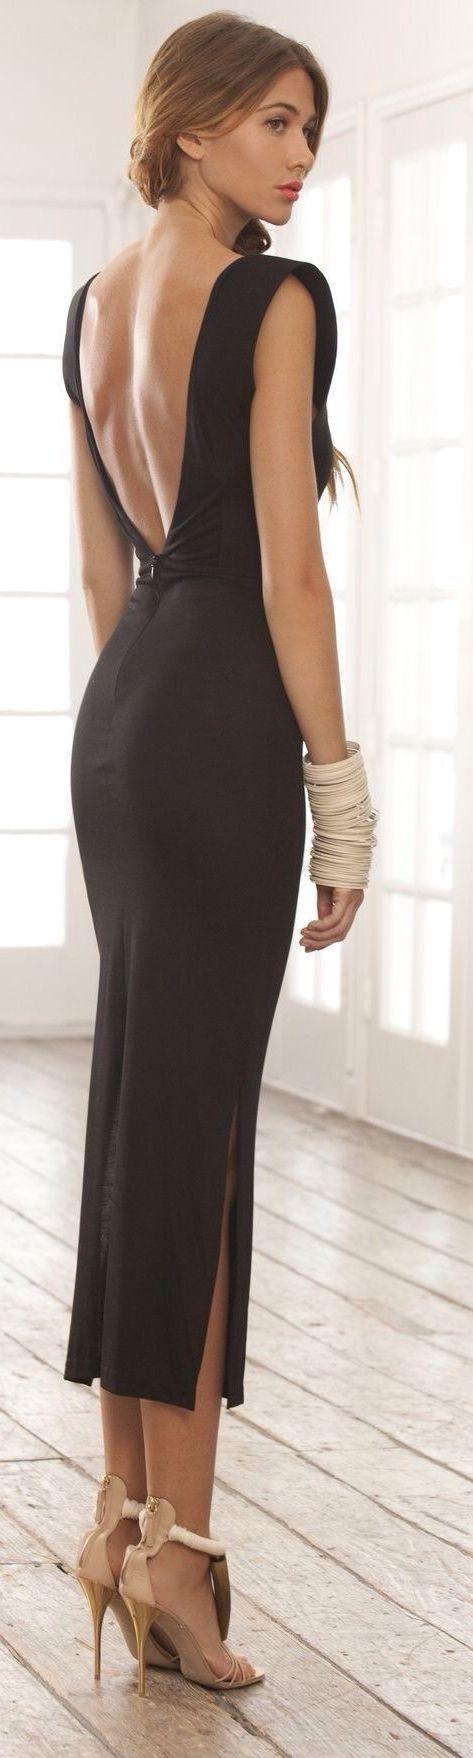 Black Chic Open Back Maxi Dress